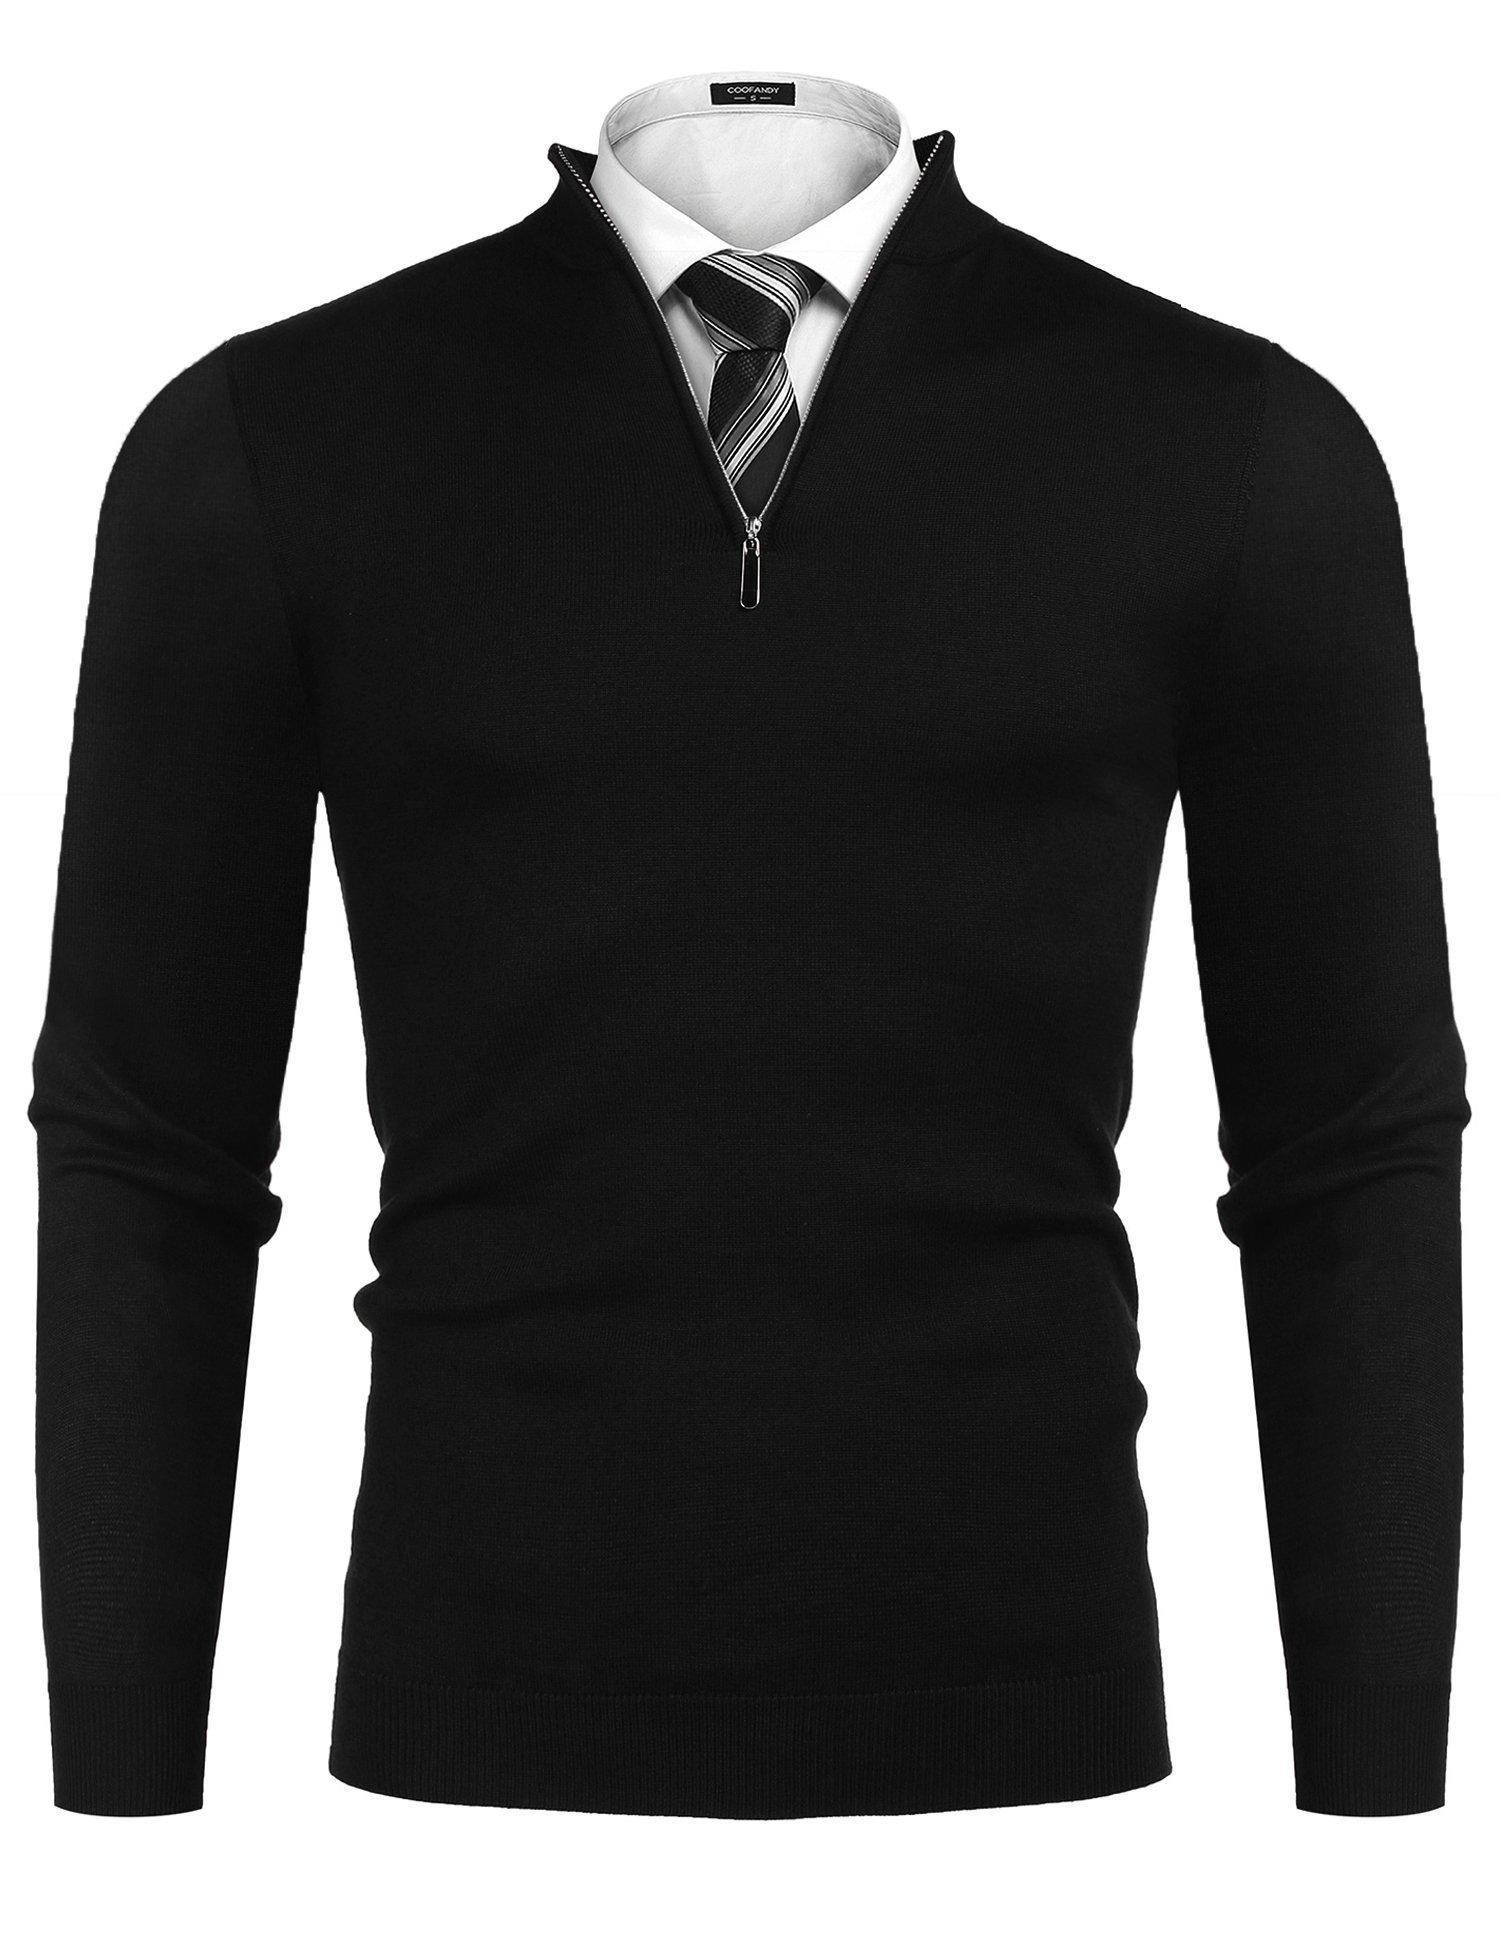 Simbama Men's Slim Fit Mock Neck Long Sleeve Quarter Zip Turtleneck Pullover Polo Sweater